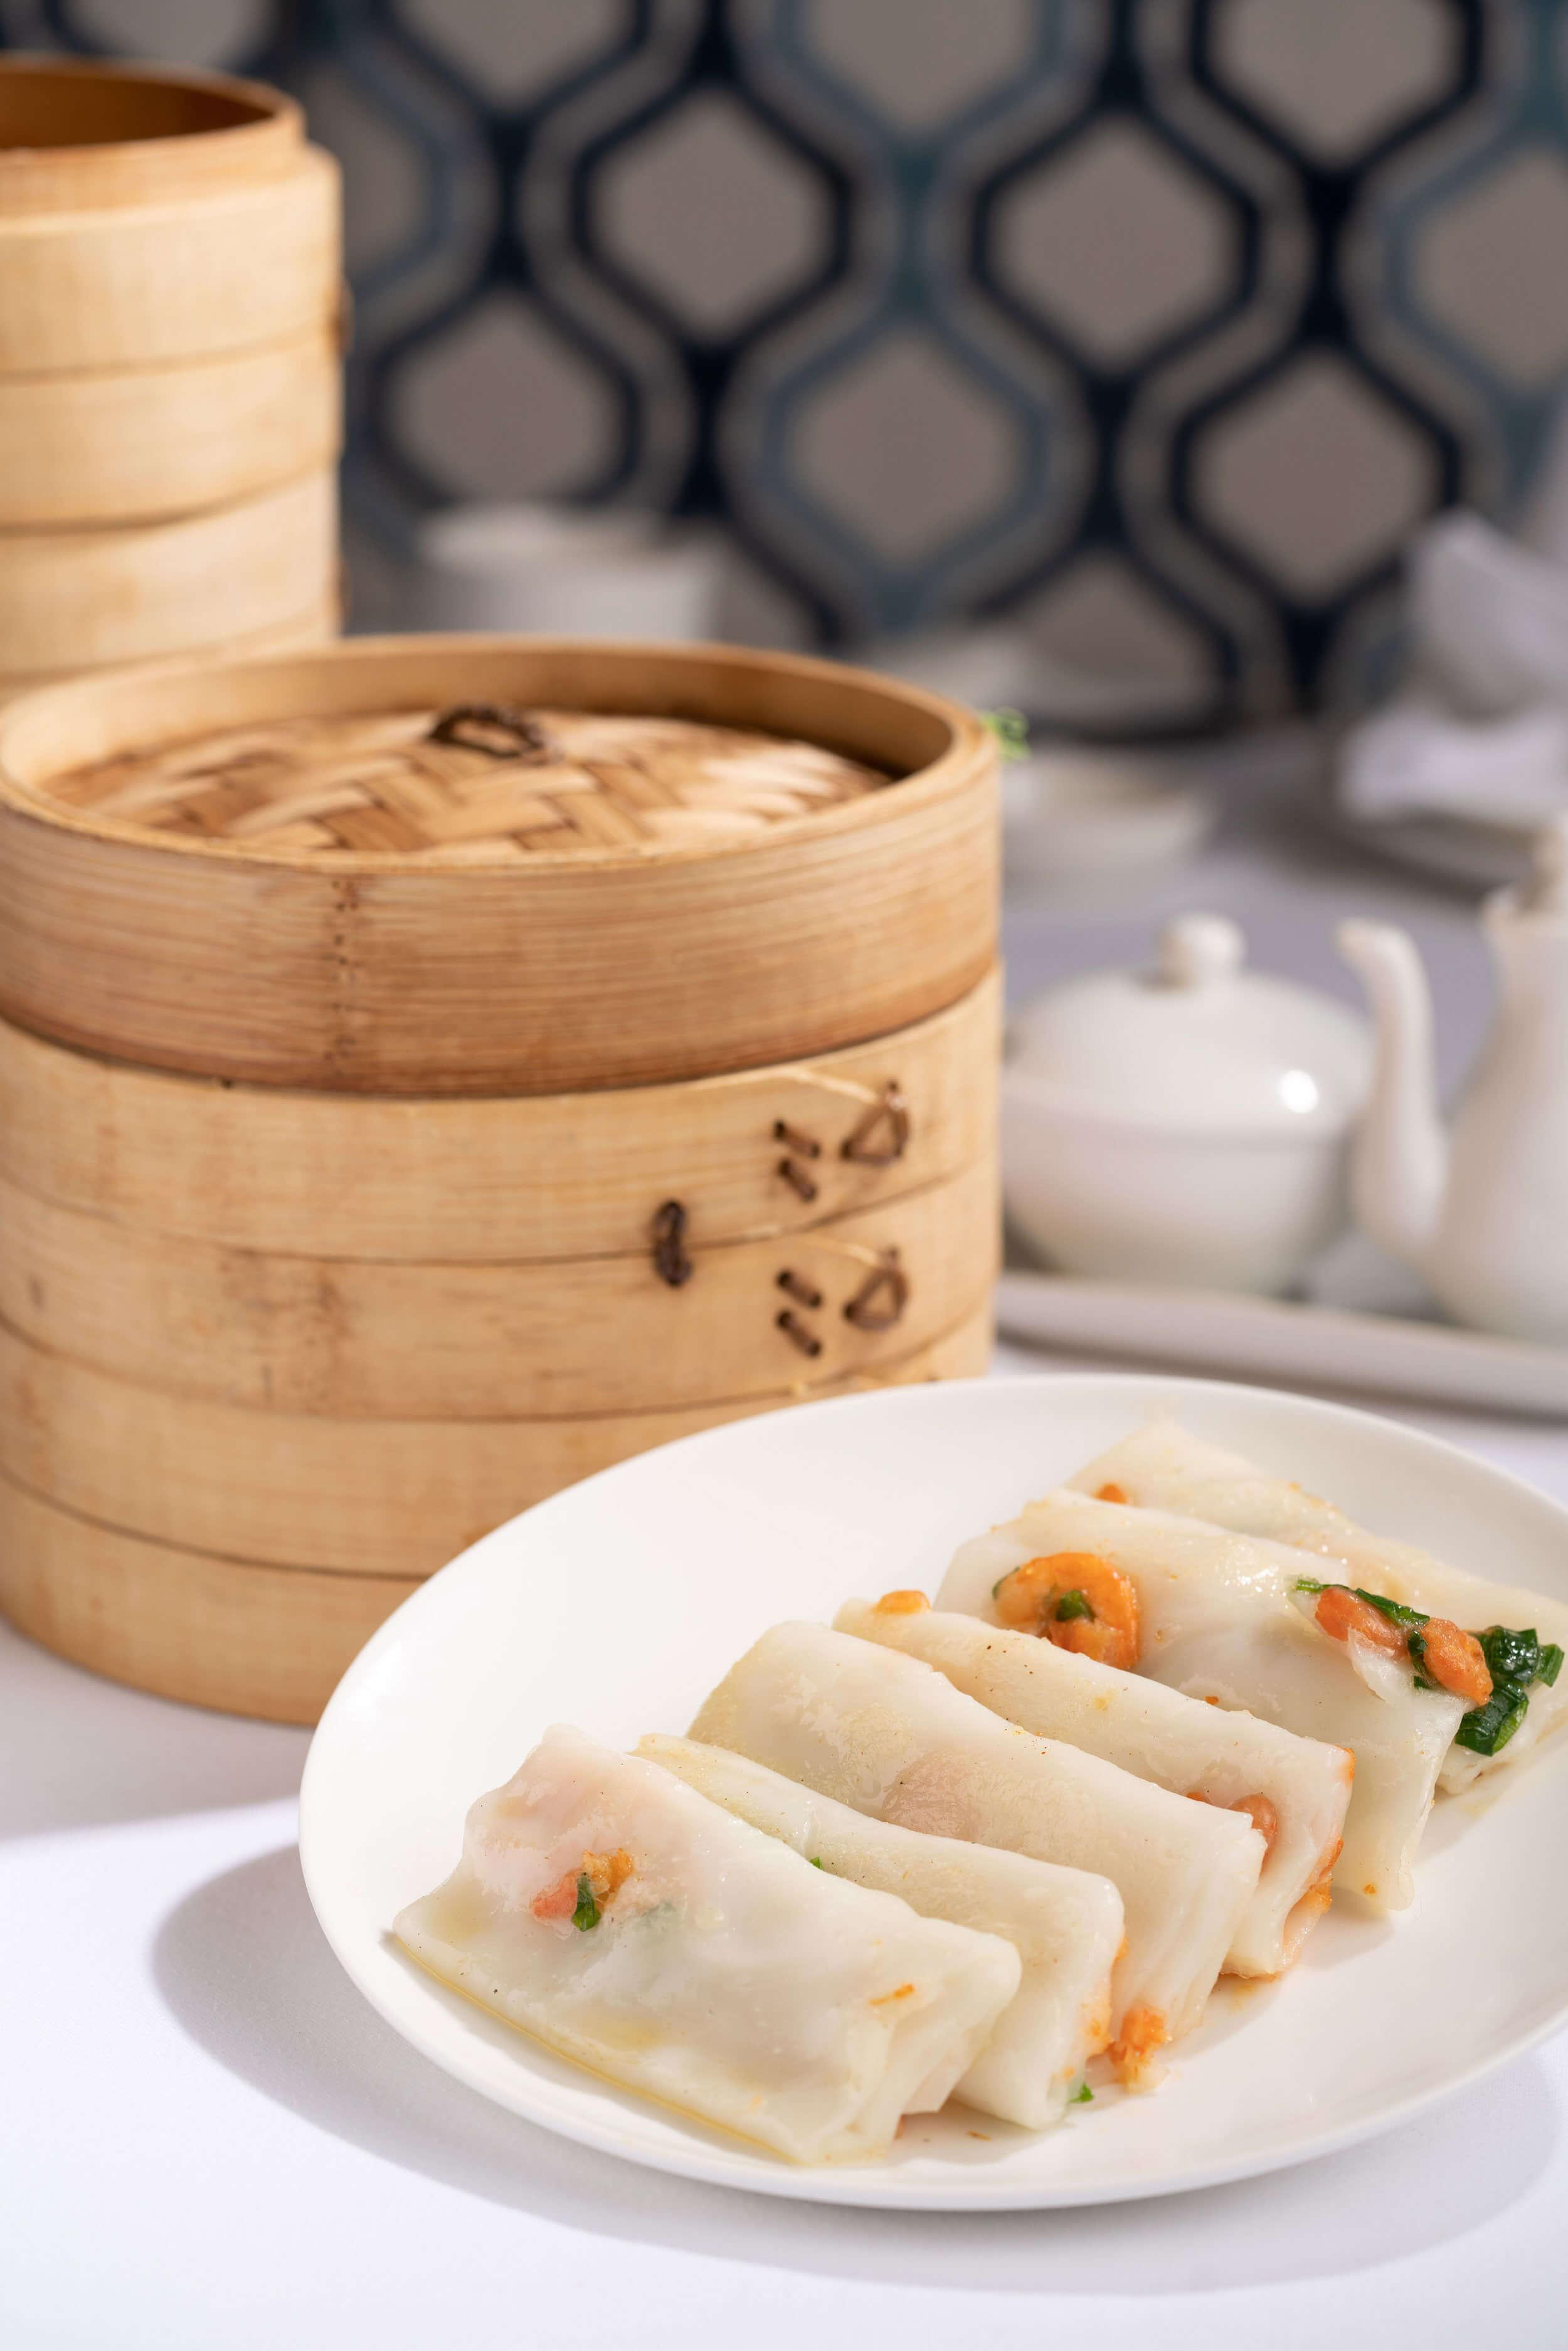 Lunch specials, dimsum parties, Chinese banquets at Hai Shin Lou Cebu